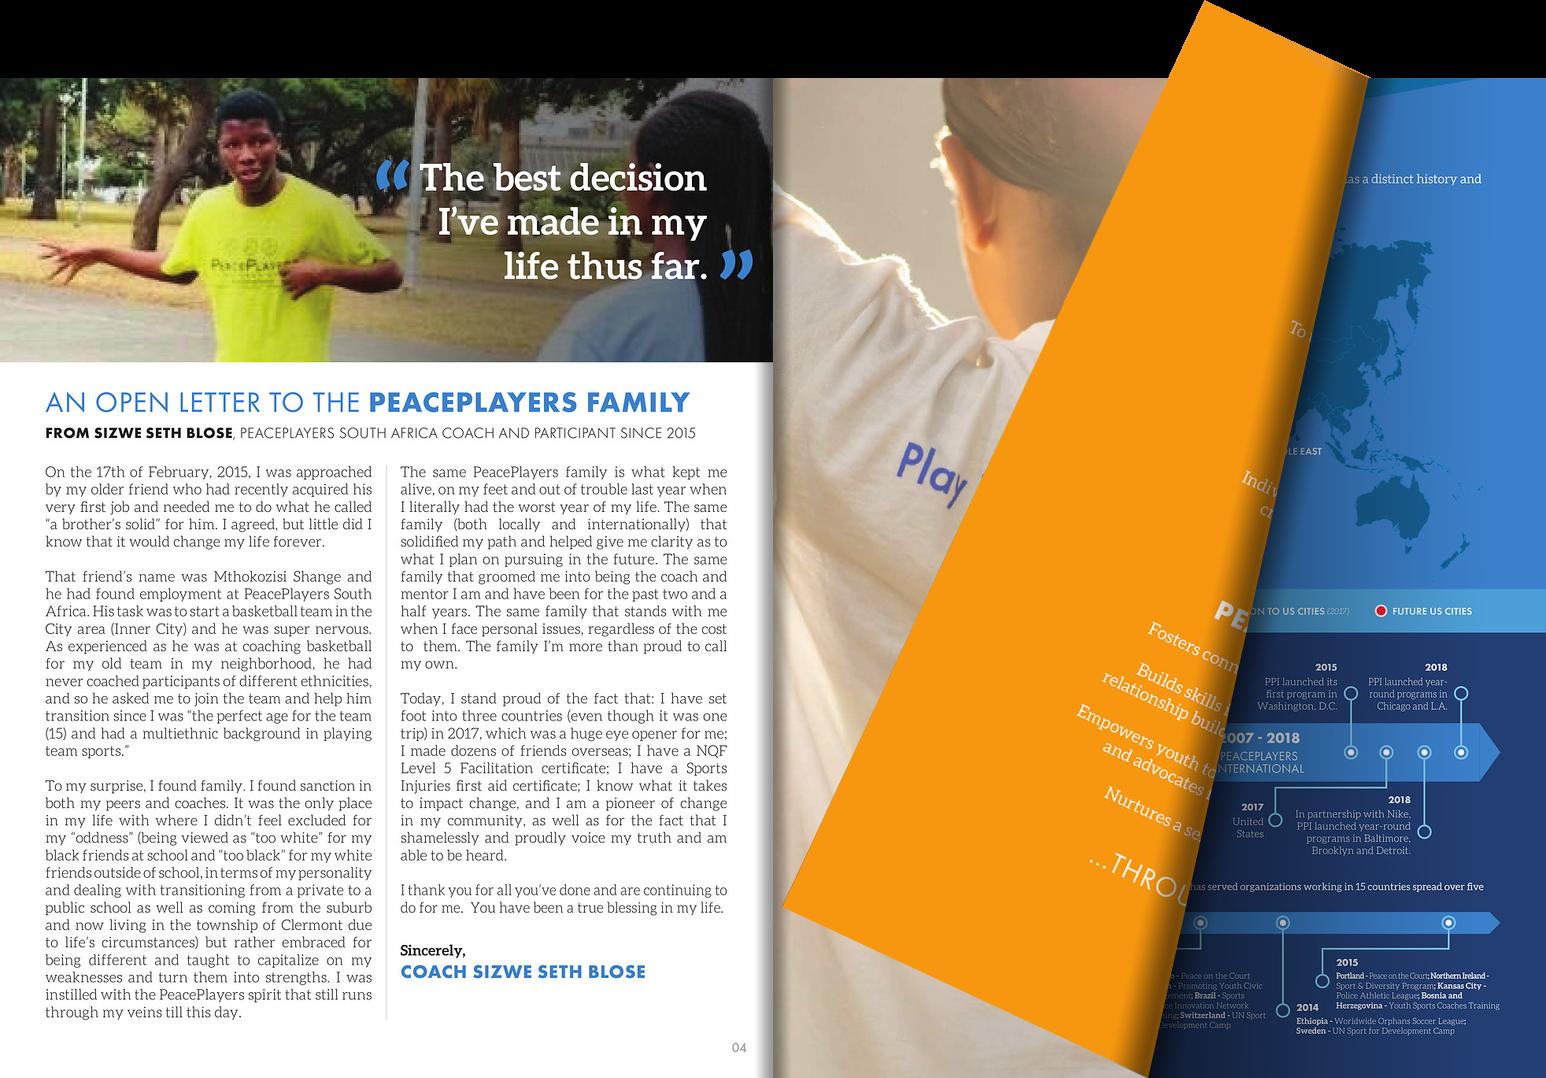 peaceplayers report 2020 (2)